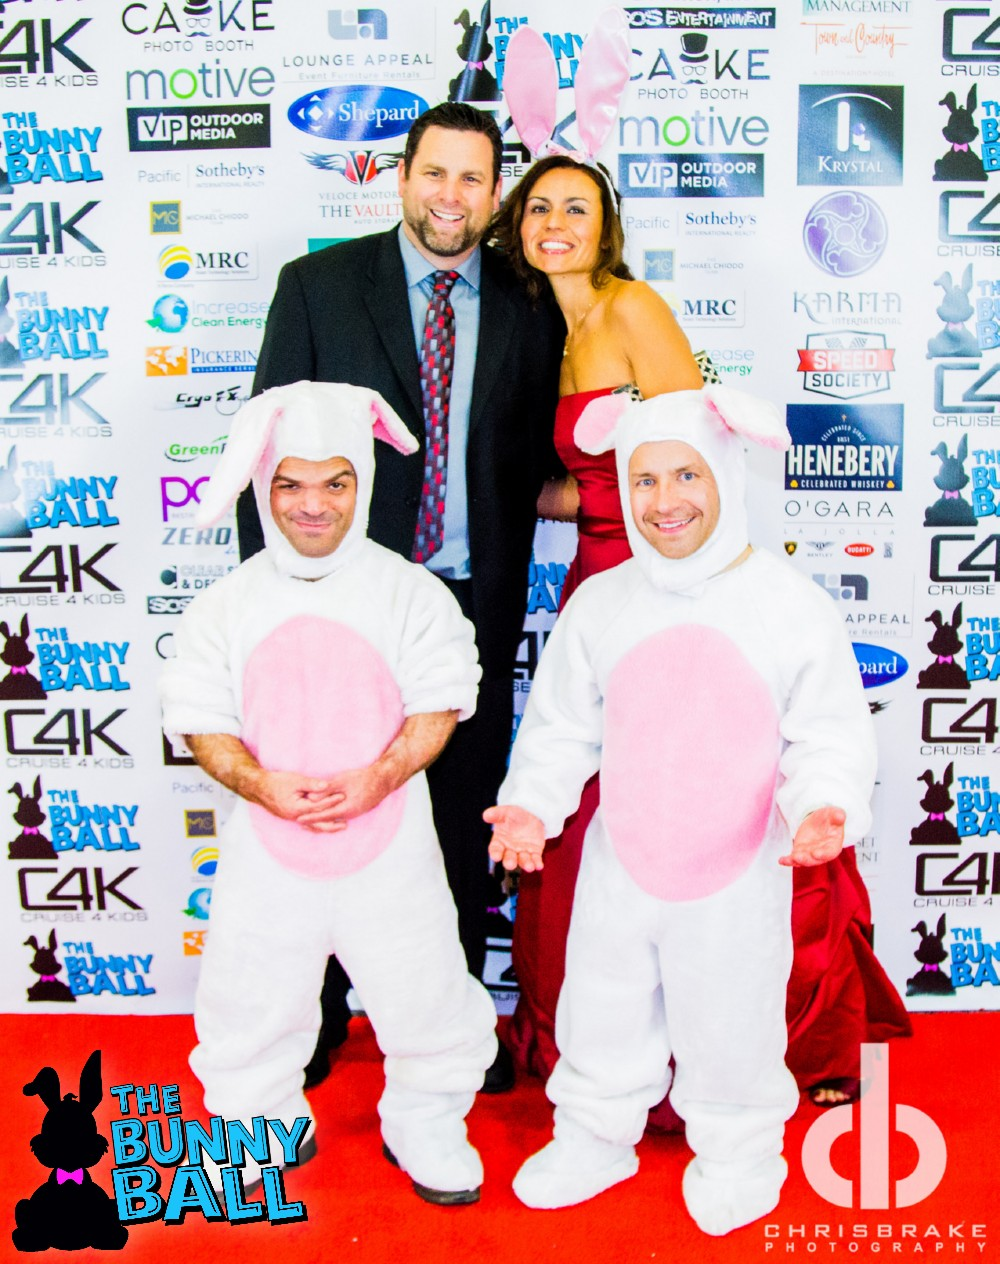 Bunny-Ball-2018-Chris-Brake- 97.jpg